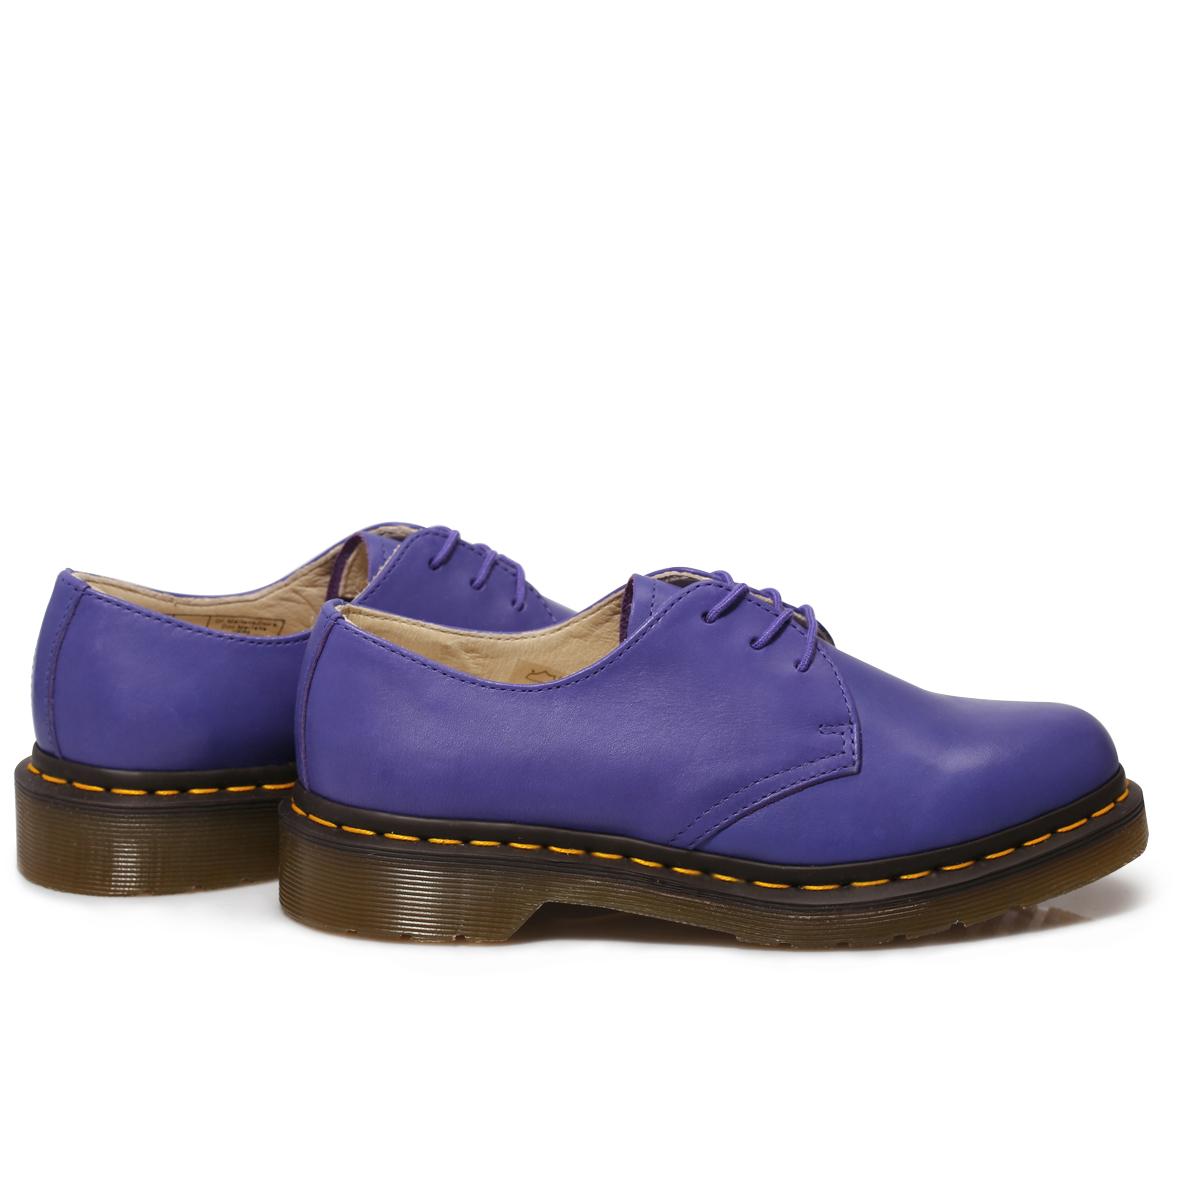 Fantastic Dr Martens Womenu2019s 1461 Blueberry Leather Cartegena Womens Shoes Size 3-8 | EBay